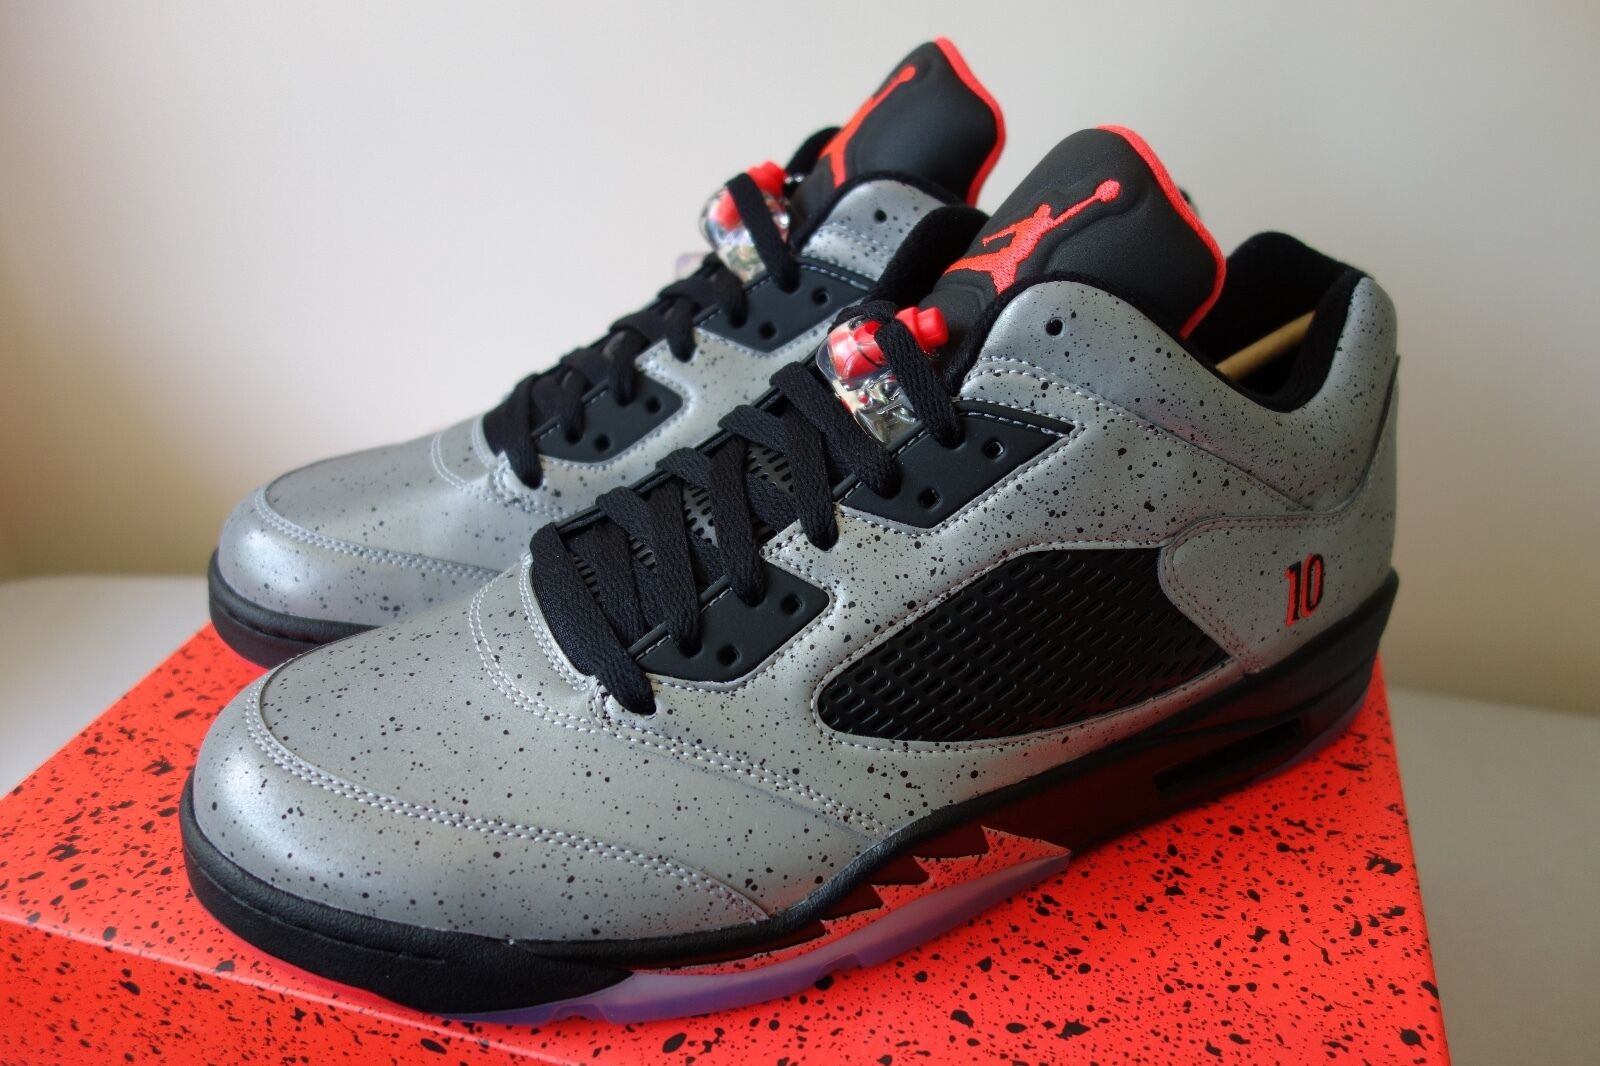 Nike Low Air Jordan 5 Retro Low Nike Neymar Jr 846315 025 Infrared Silver off white Fox 1 b955c2